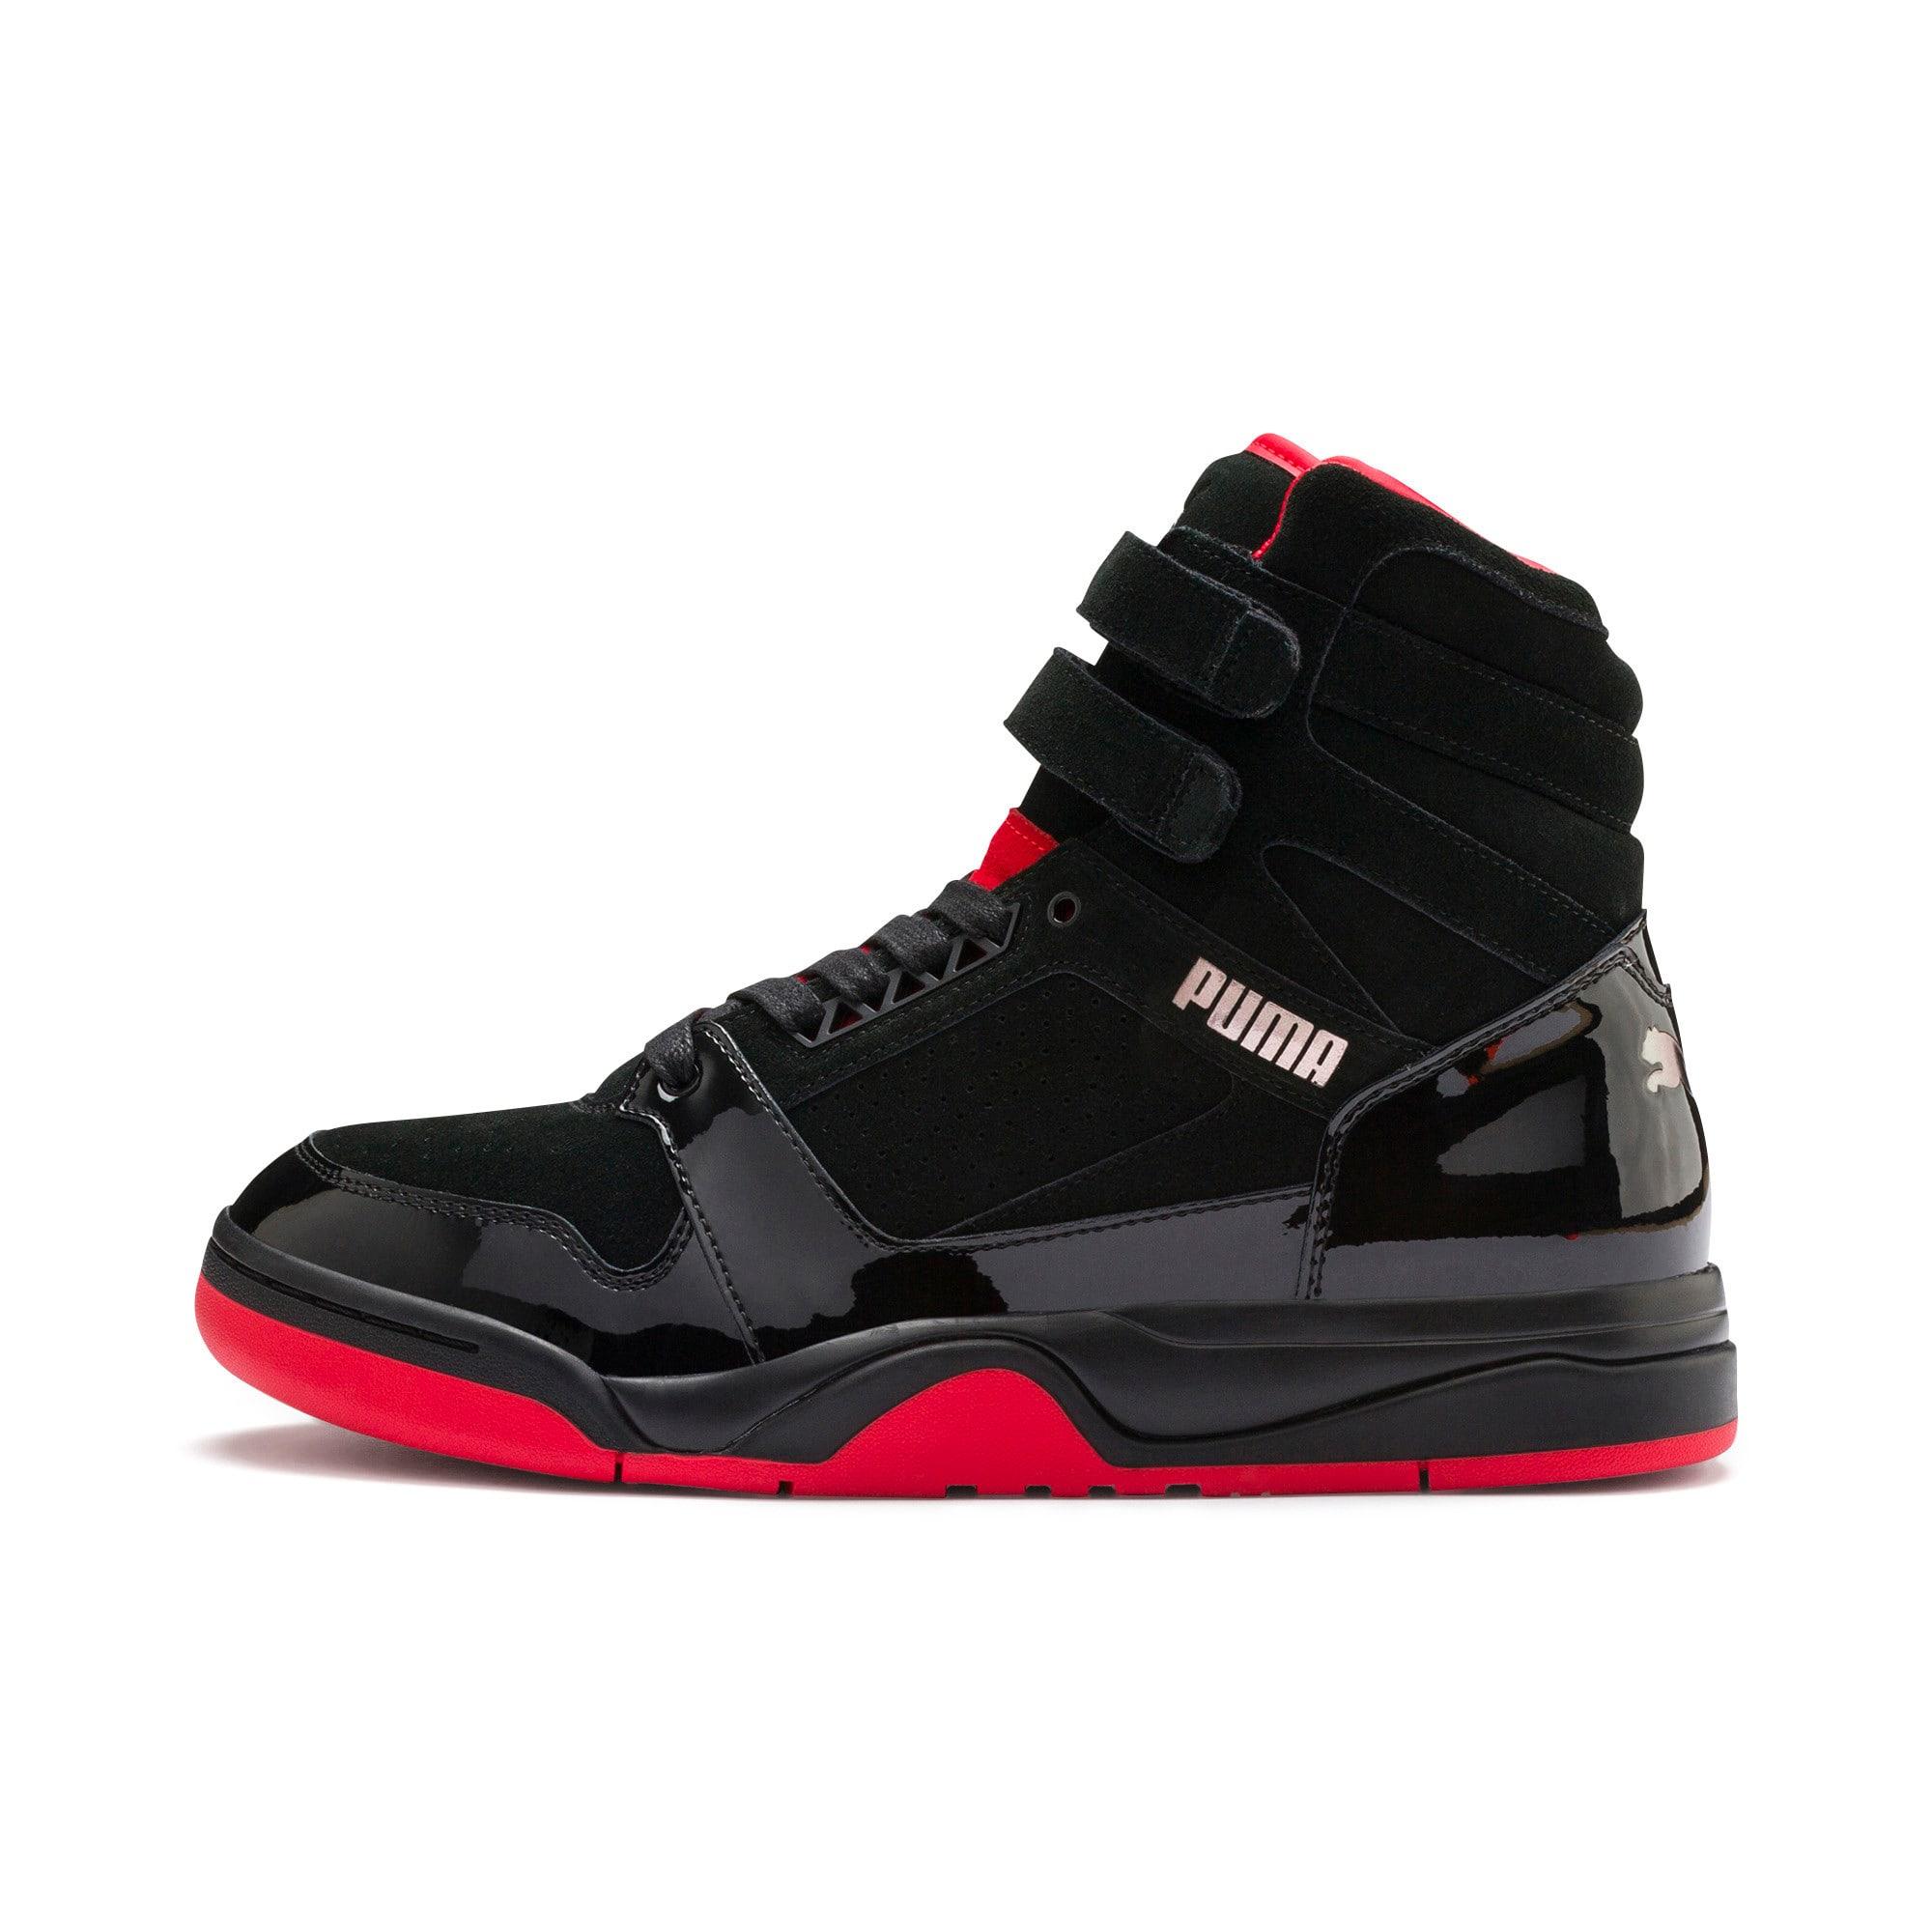 taille 40 63657 b353a Chaussure de basket Place Guard Red Carpet Mid-Cut